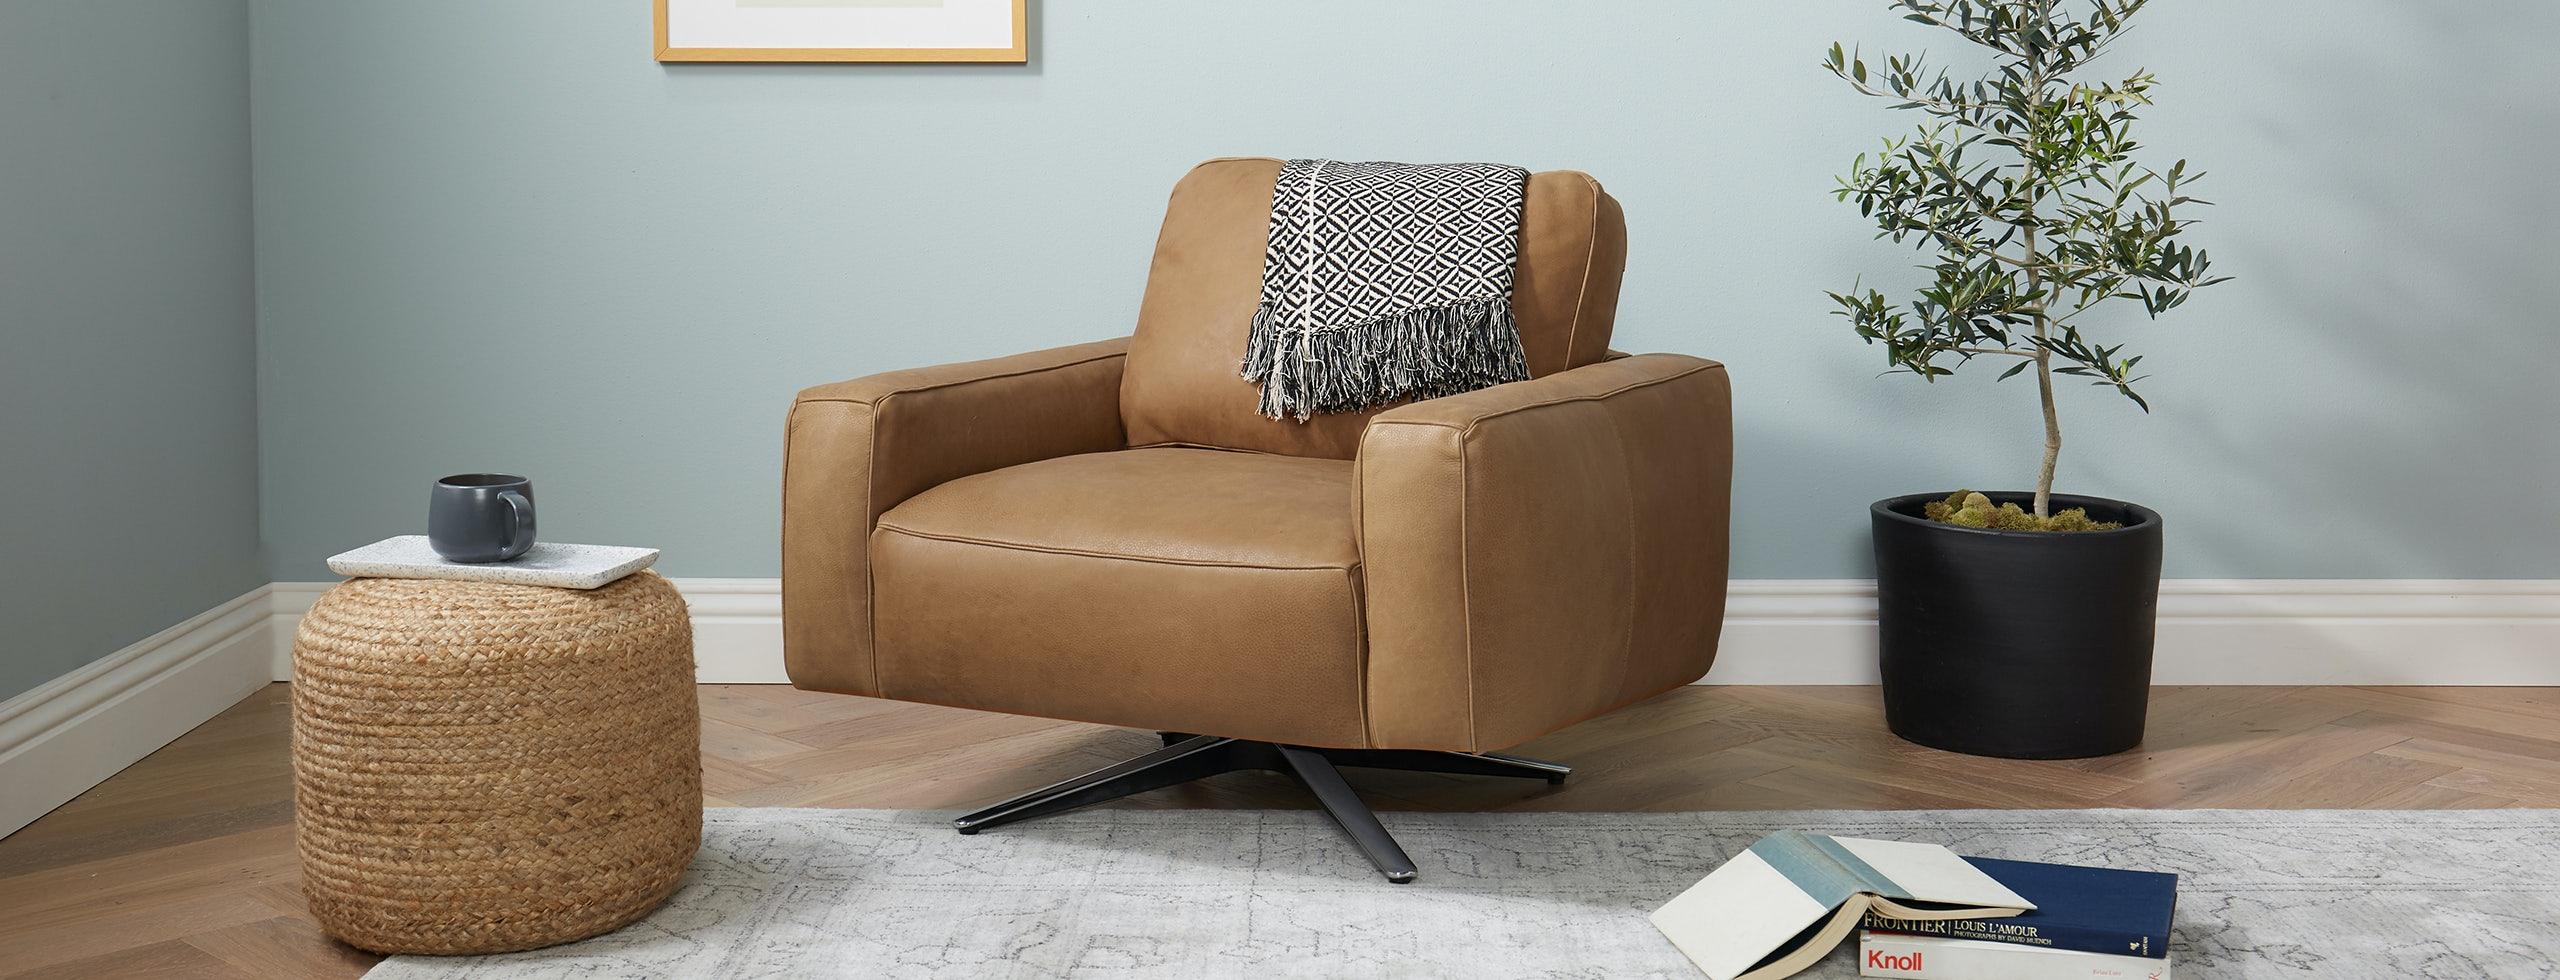 Nova Leather Swivel Chair Toledo Camel